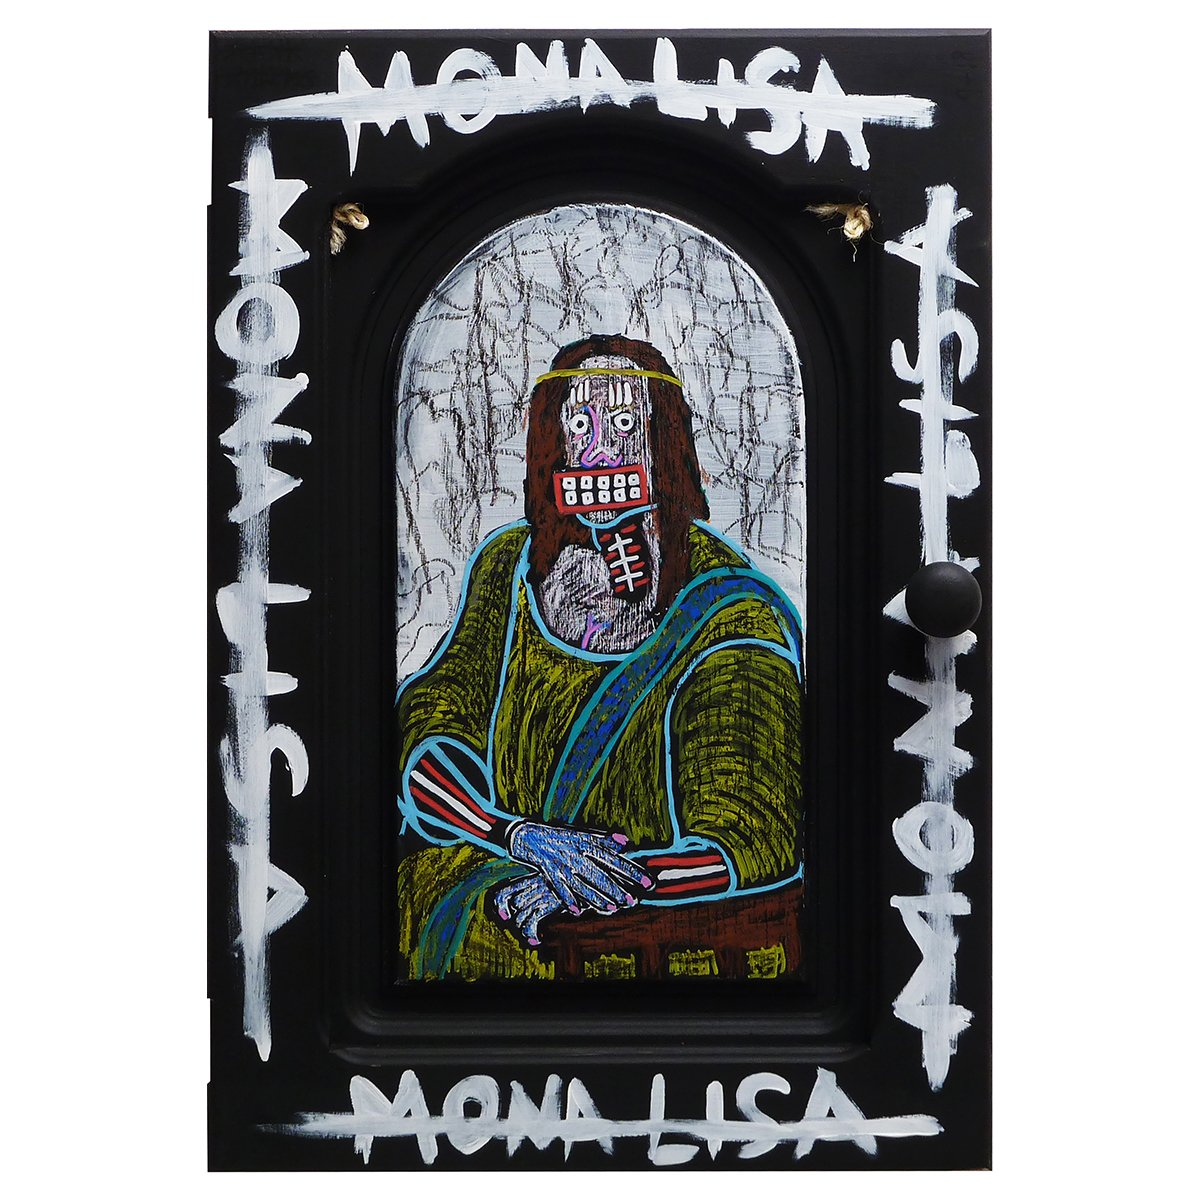 MONA LISA - Frank Willems